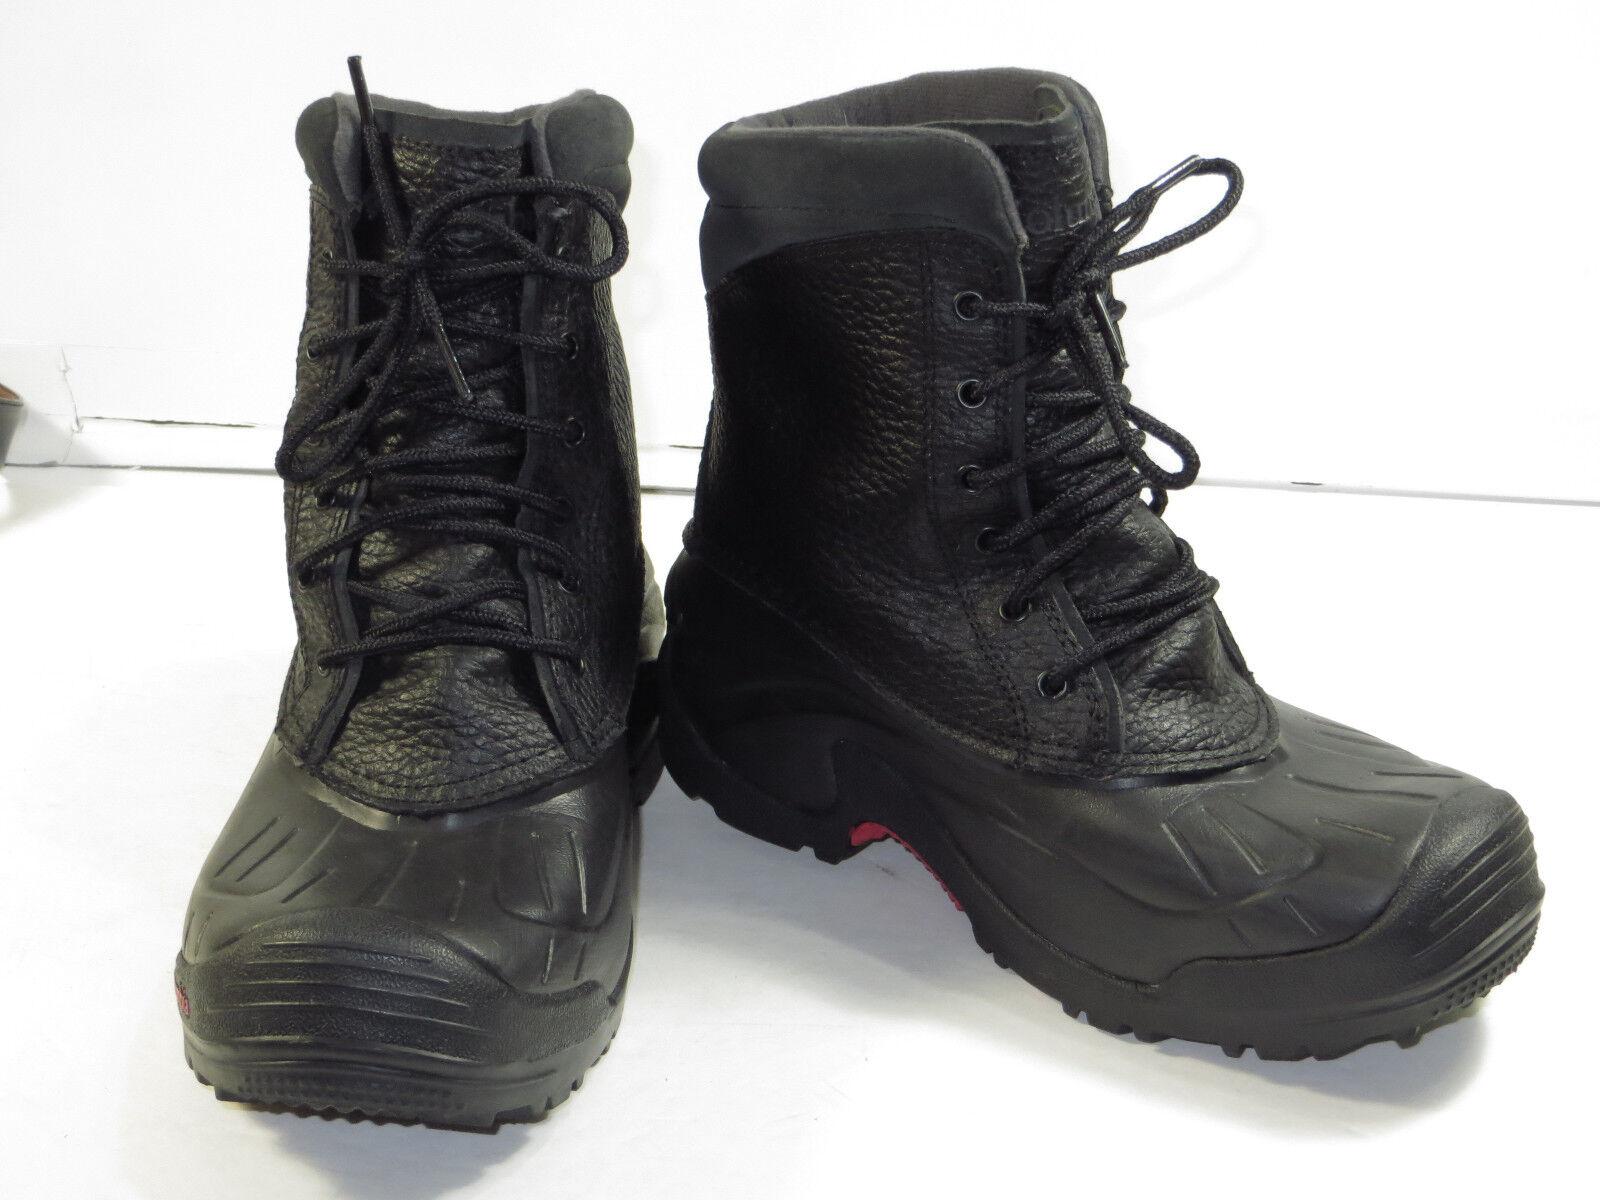 Ex COND!worn ones,Columbia Bugalite Bm1373-010 men's winter Boots sz 8 120